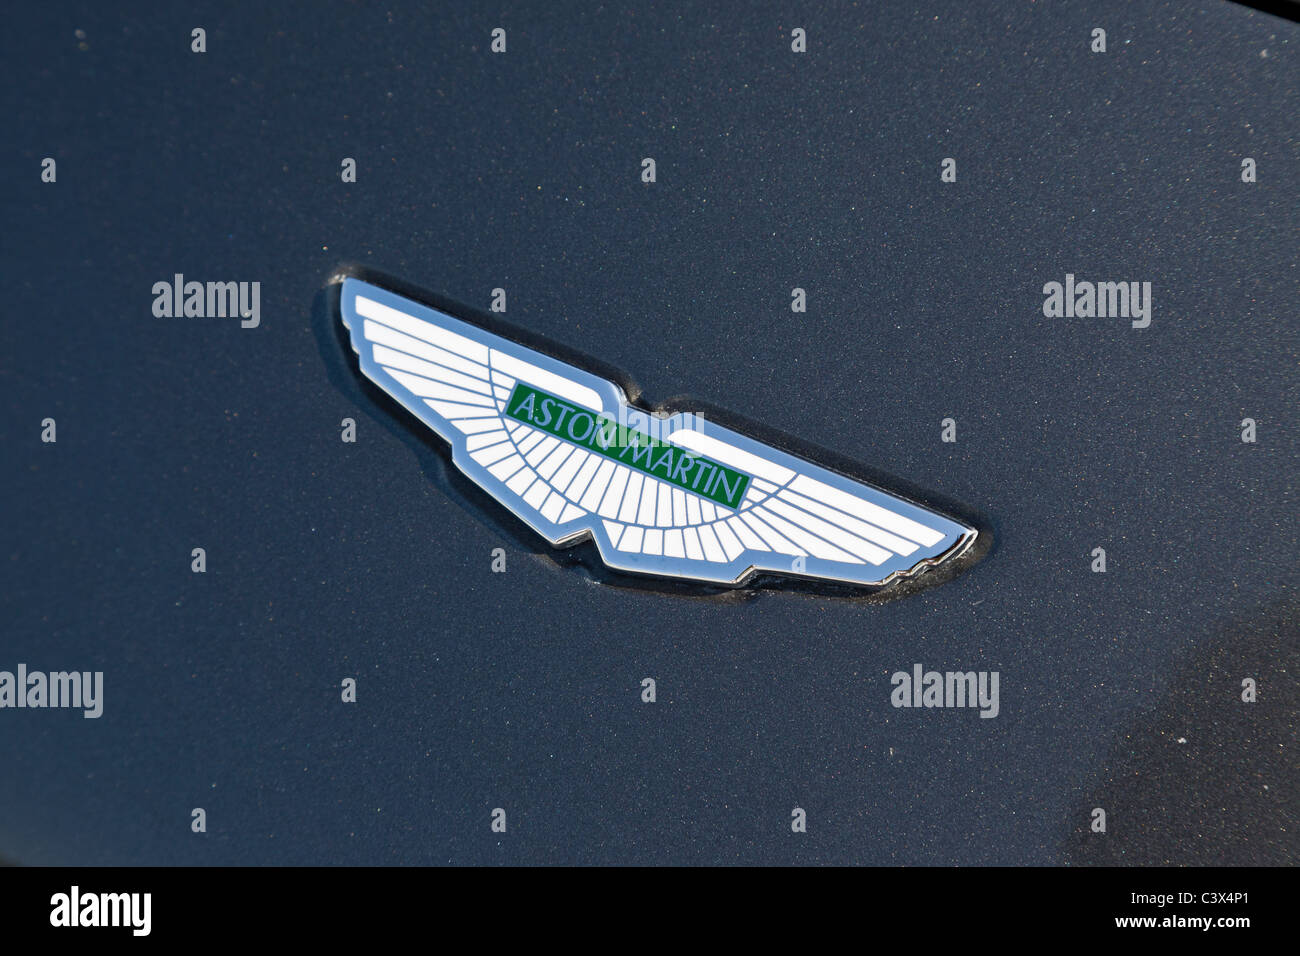 Aston Martin badge on bonnet of car Stock Photo